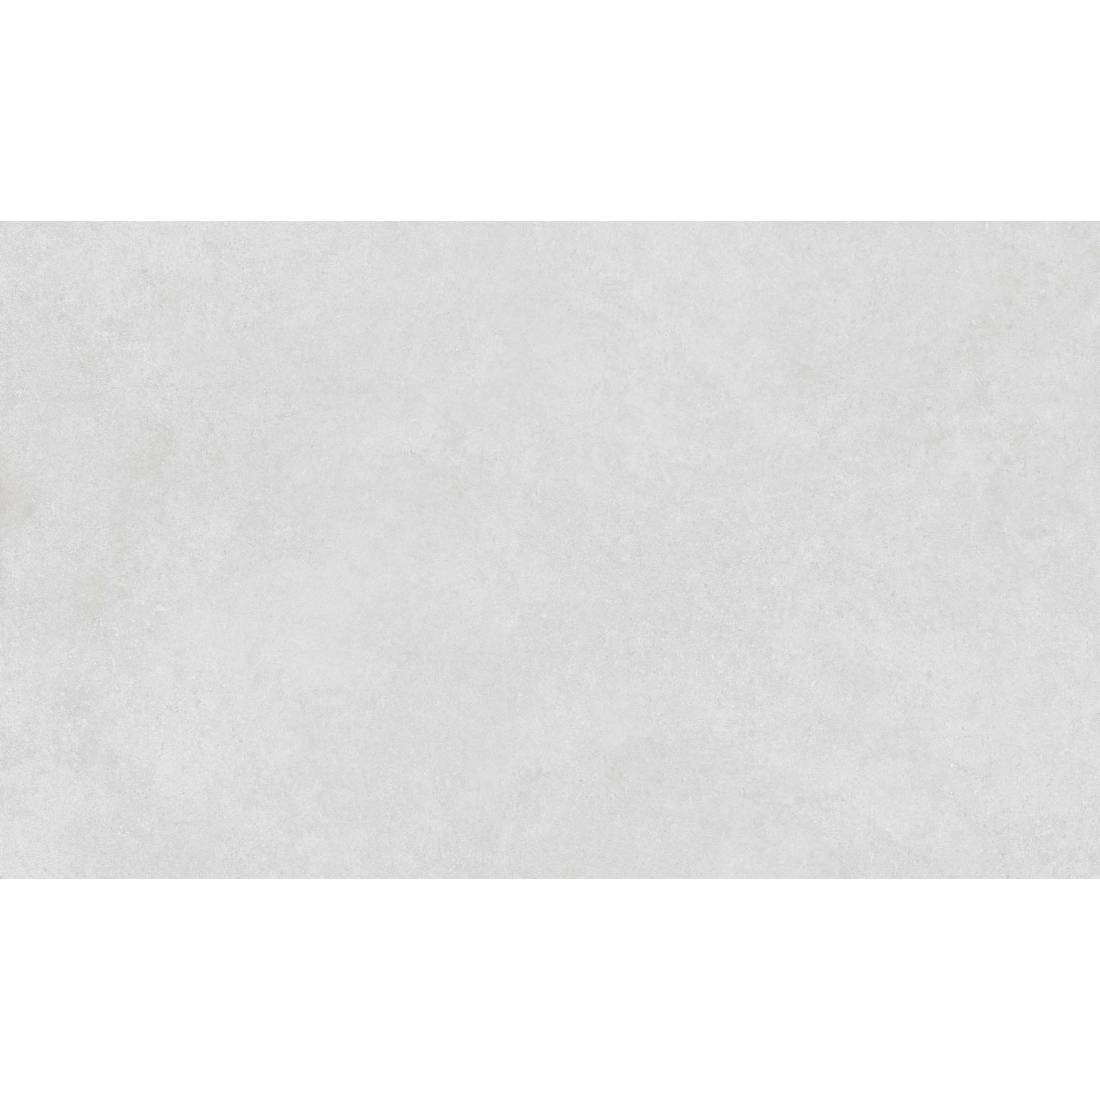 Belgravia 33.3x55 Perla Silver Matt 1